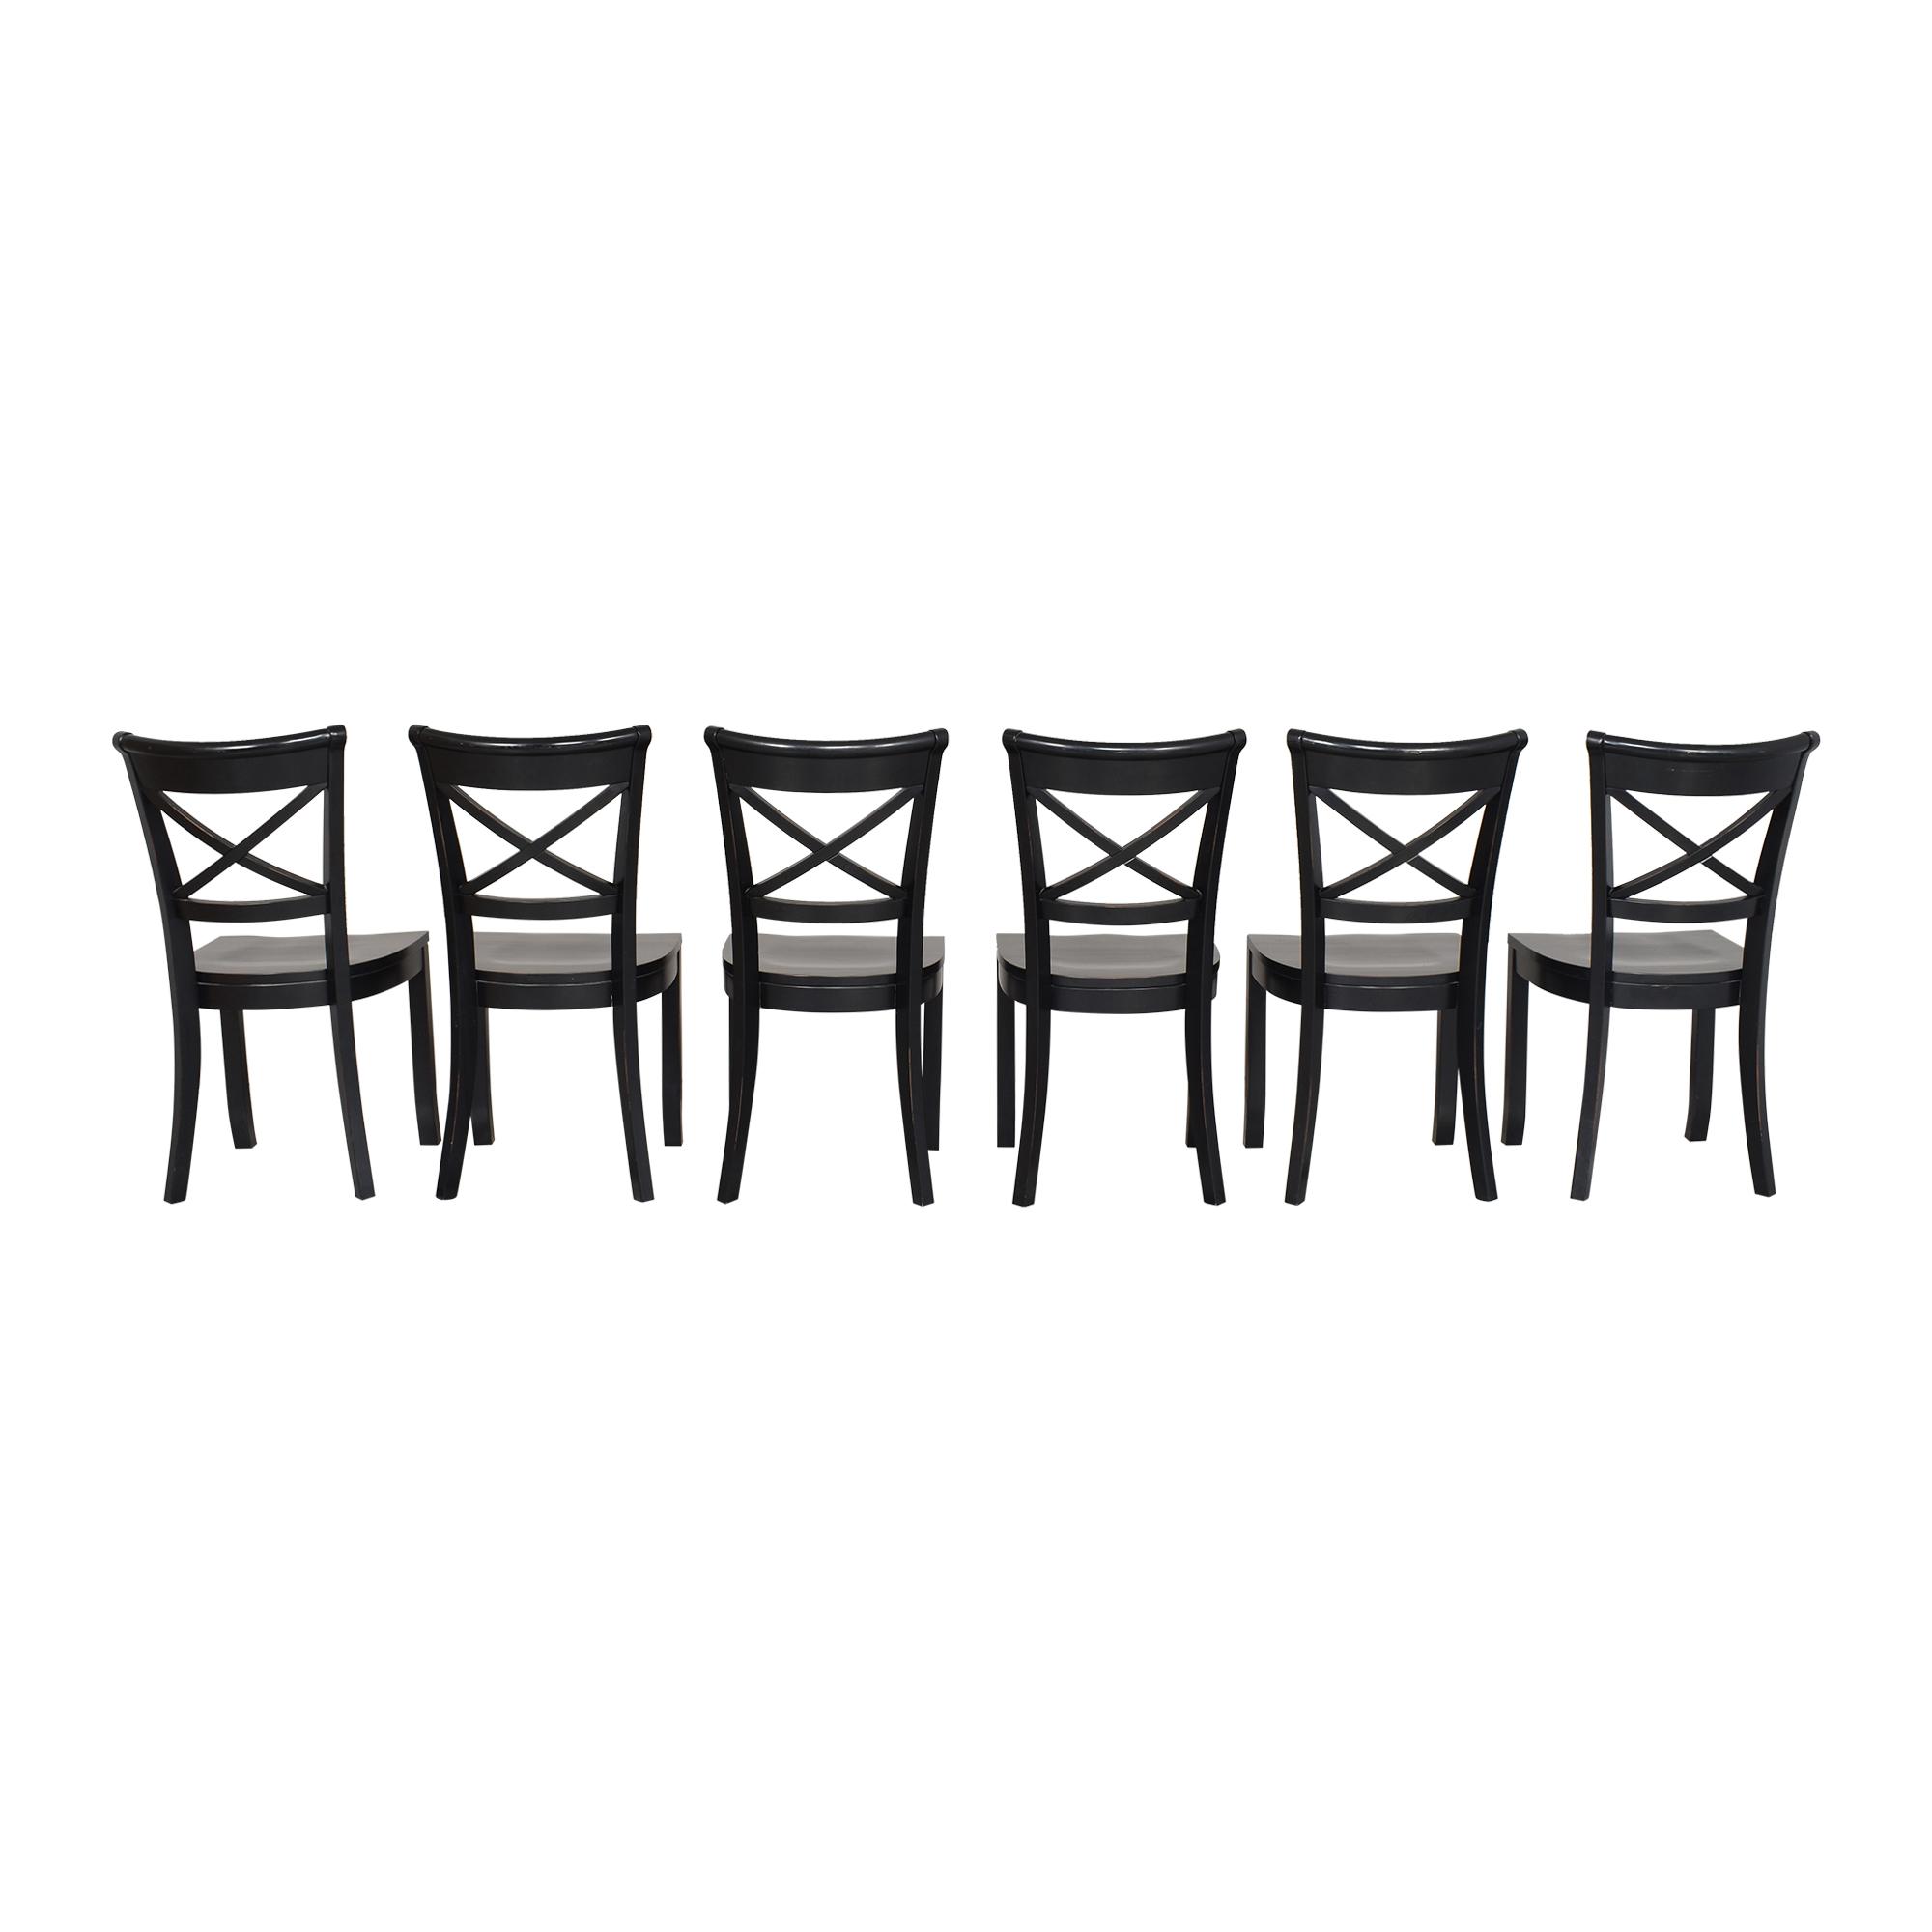 shop Crate & Barrel Vintner X Back Dining Chairs Crate & Barrel Dining Chairs